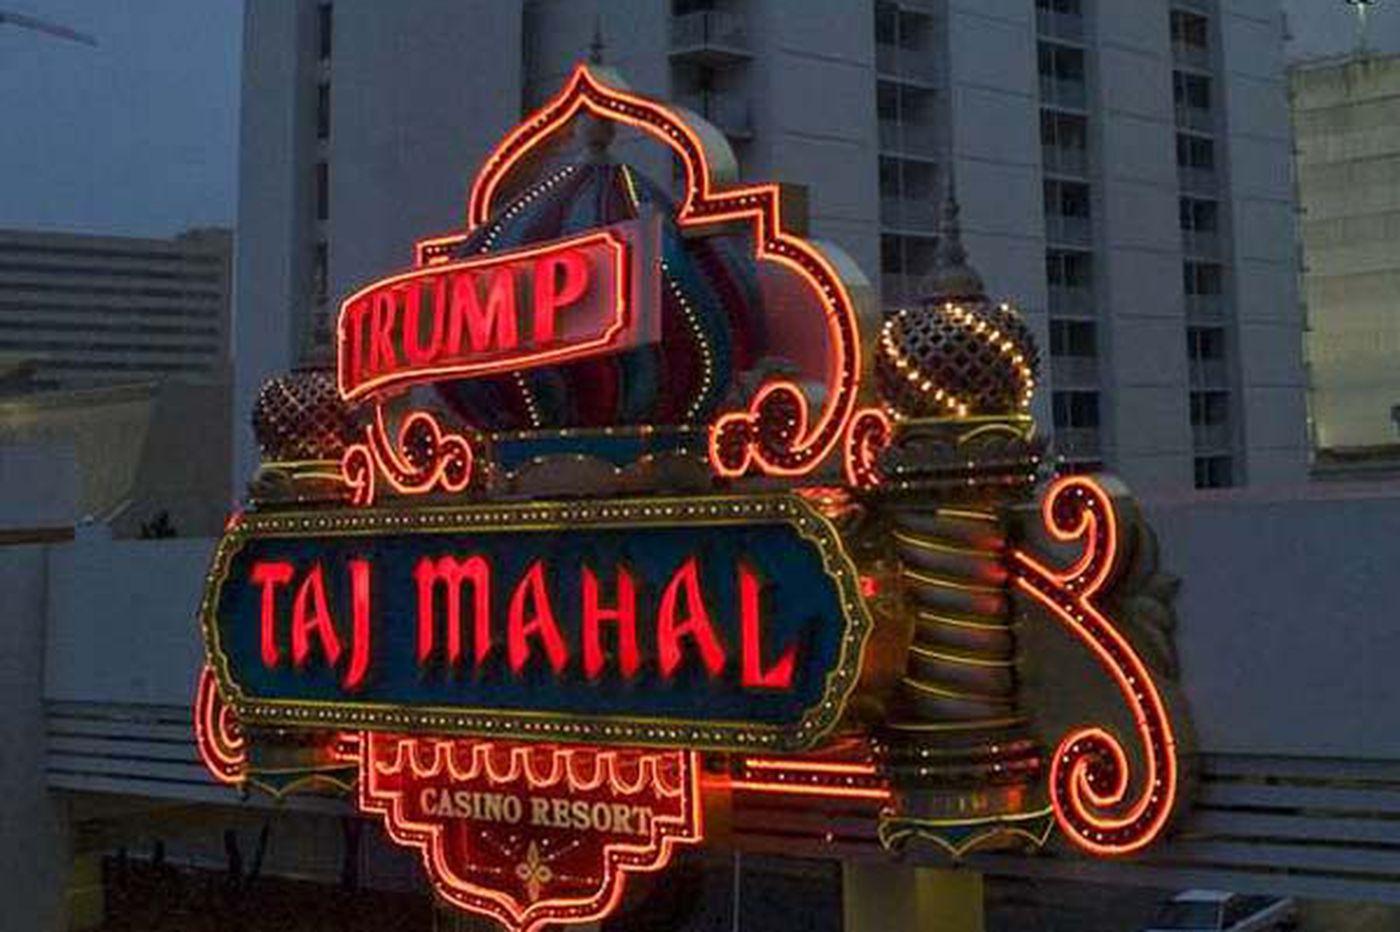 N.J. issues Taj Mahal closing plan